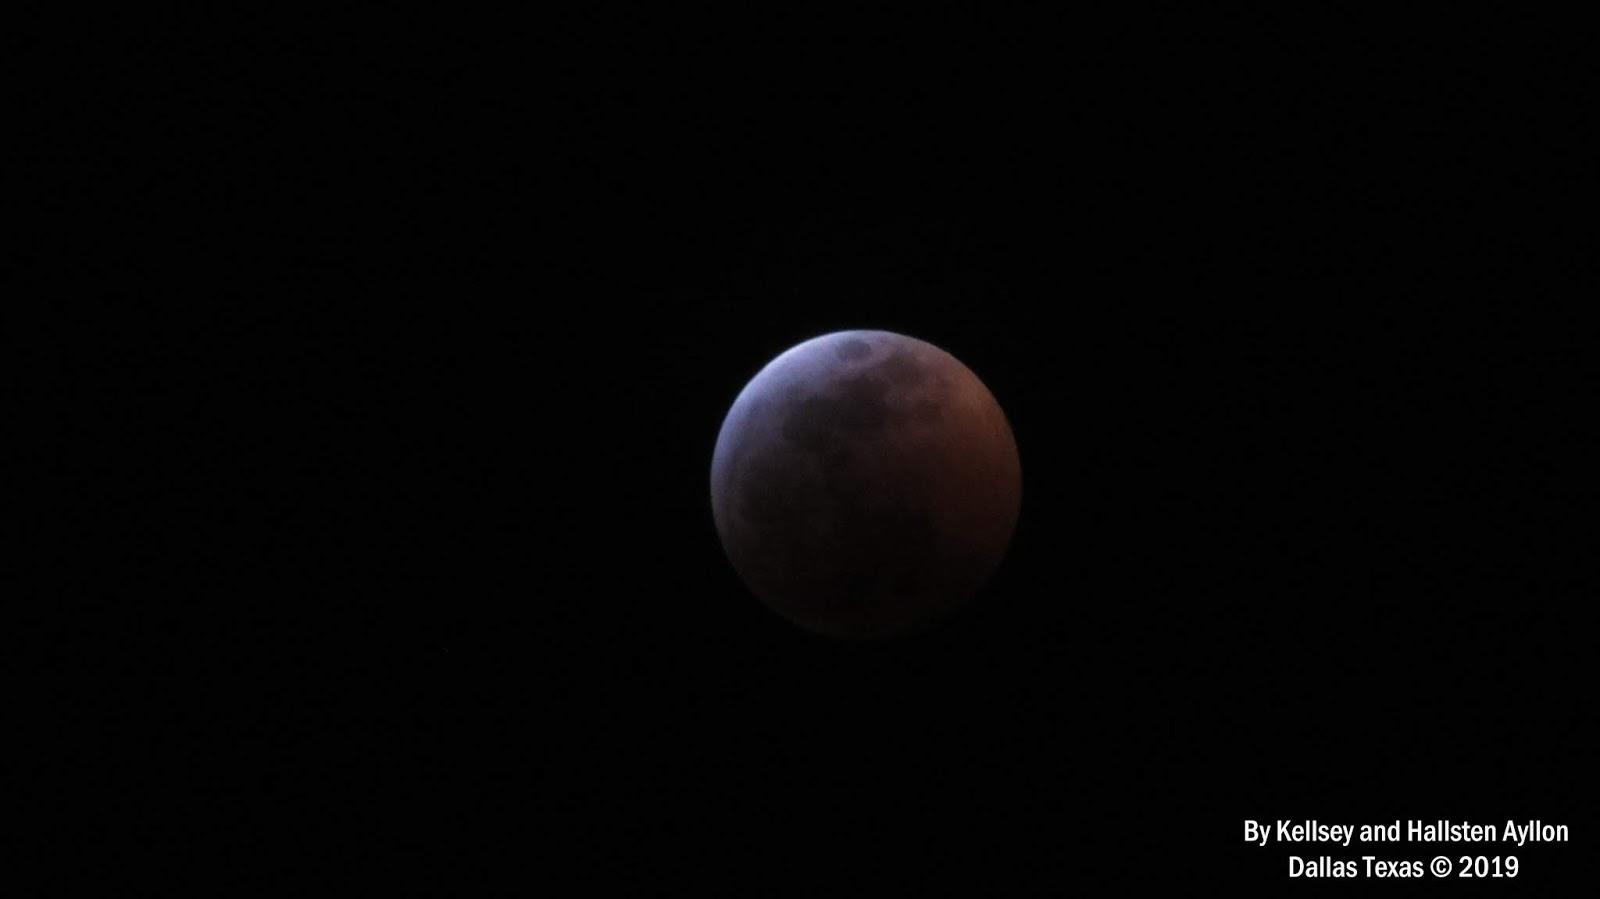 blood moon january 2019 dallas tx - photo #16